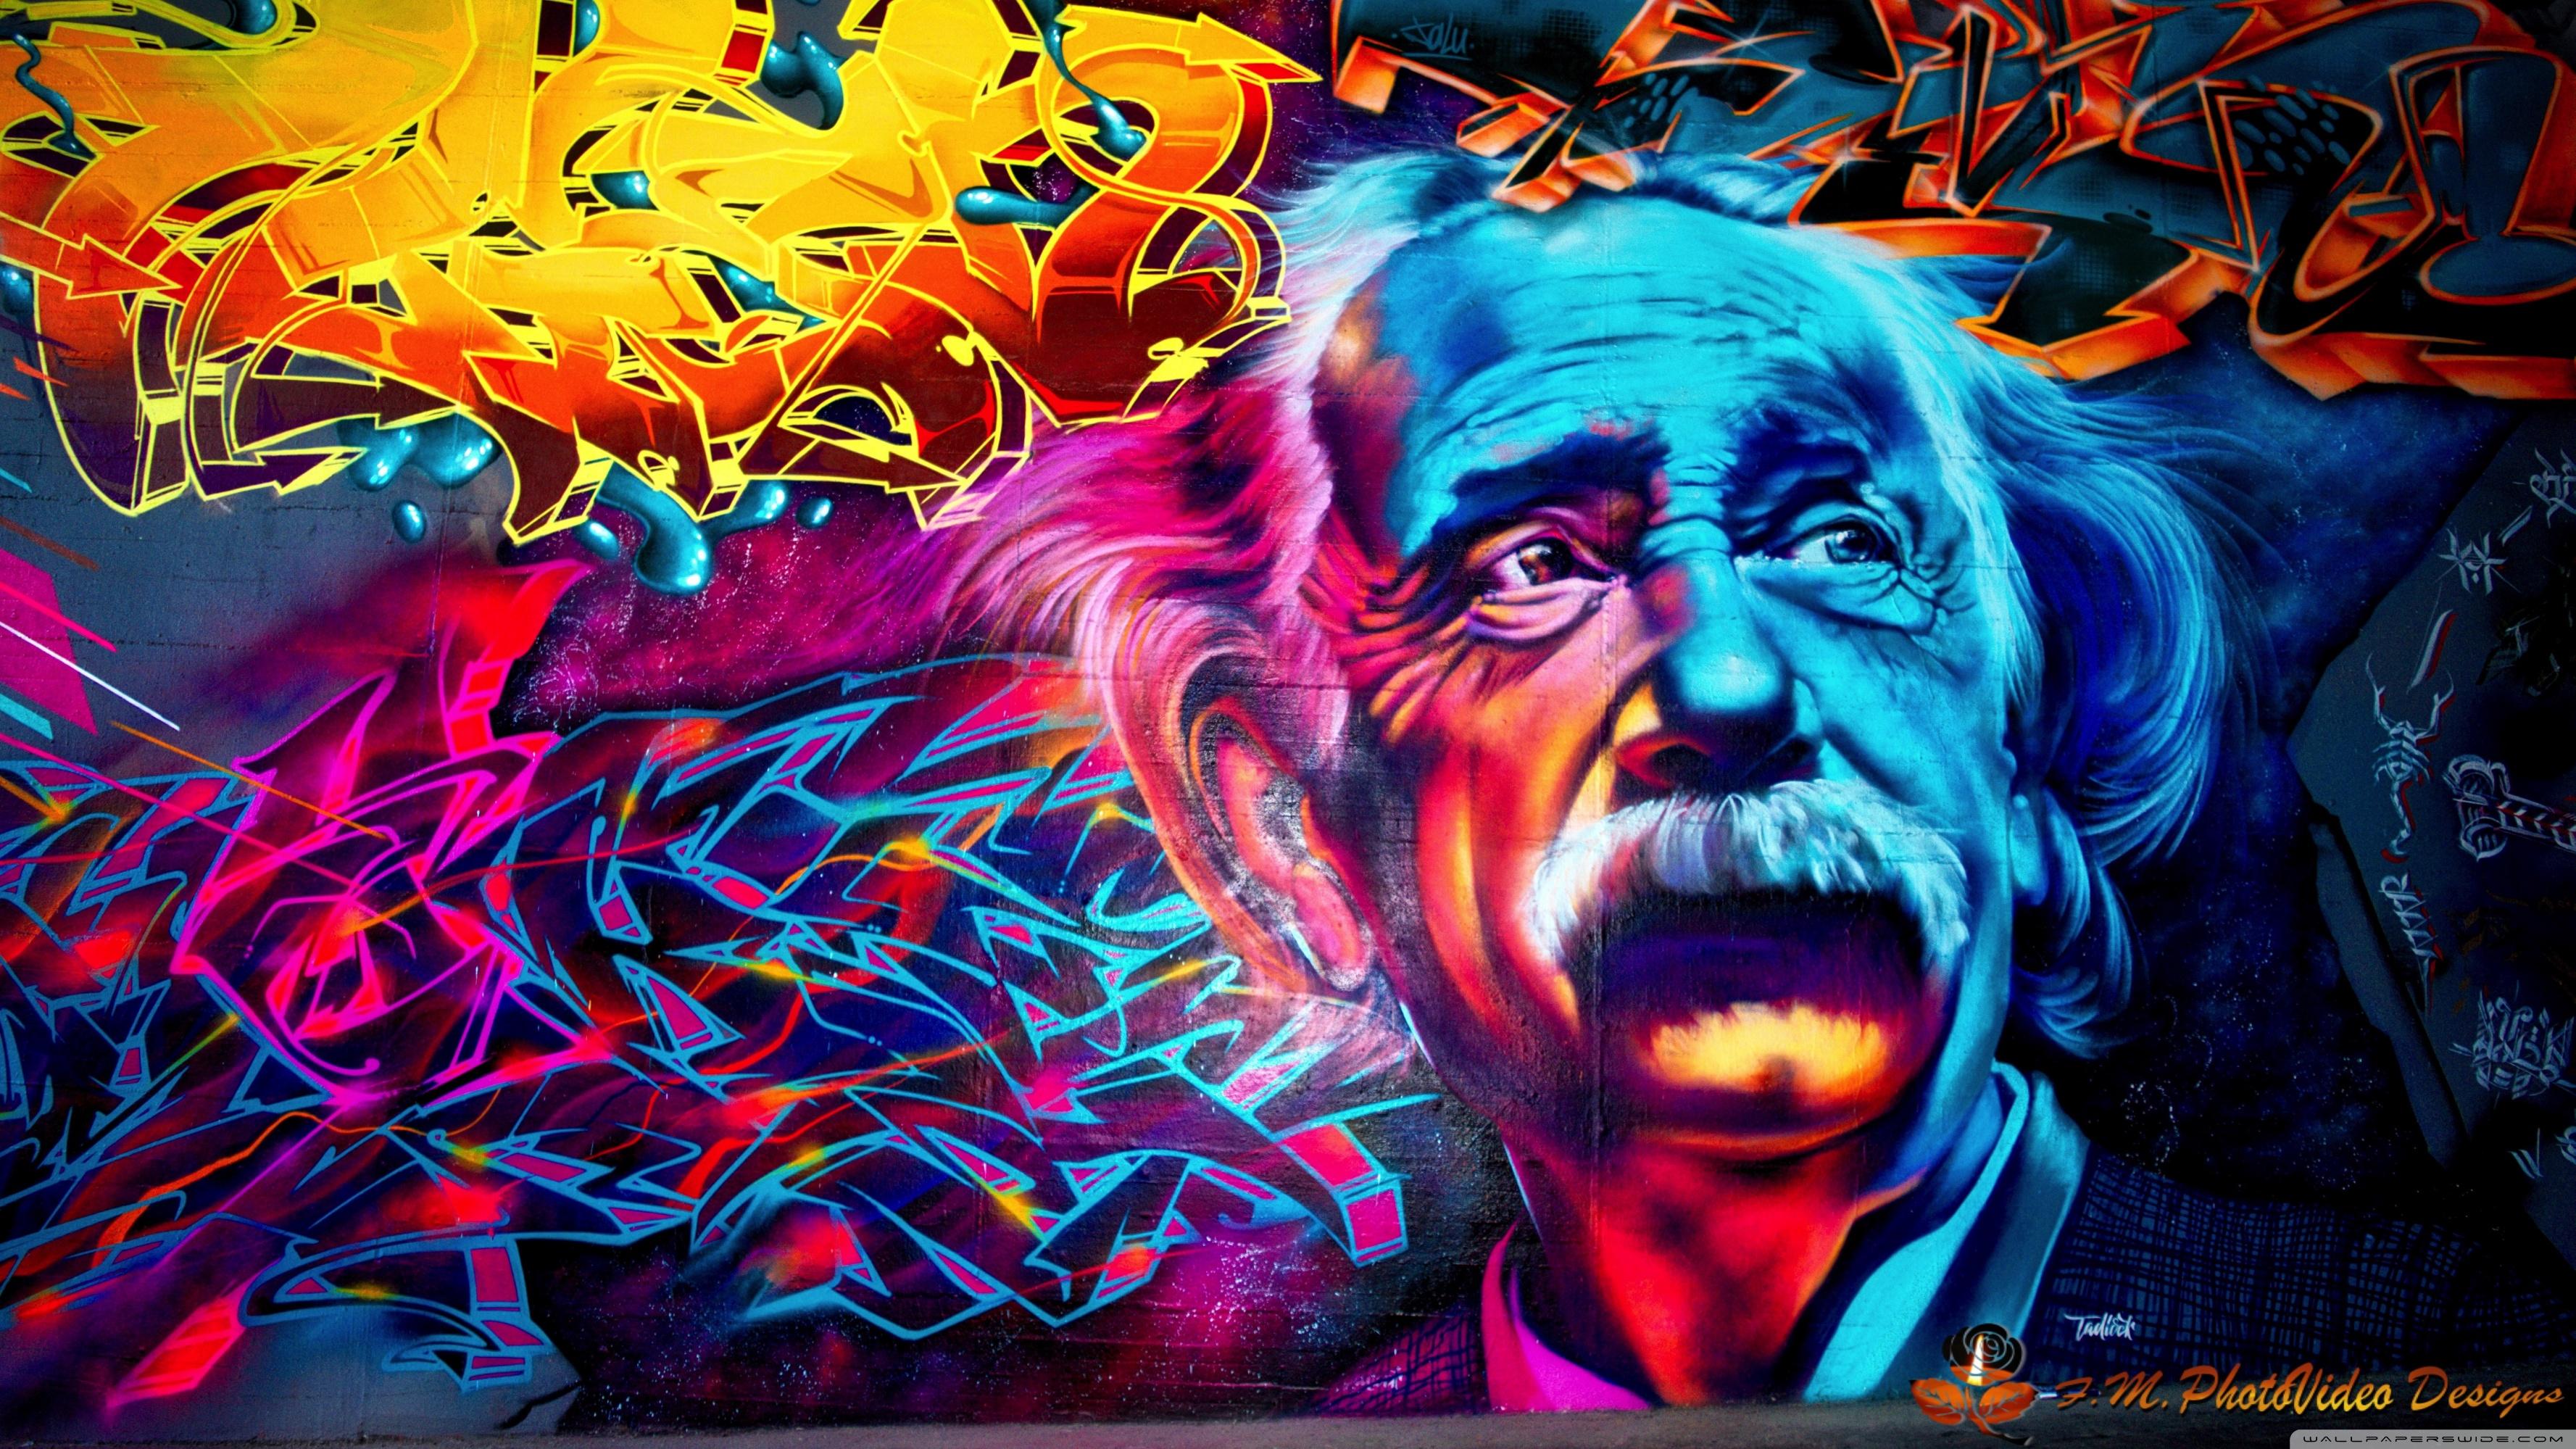 Graffiti Wallpaper Hd Street Art 4k Hd Desktop Wallpaper For 4k Ultra Hd Tv